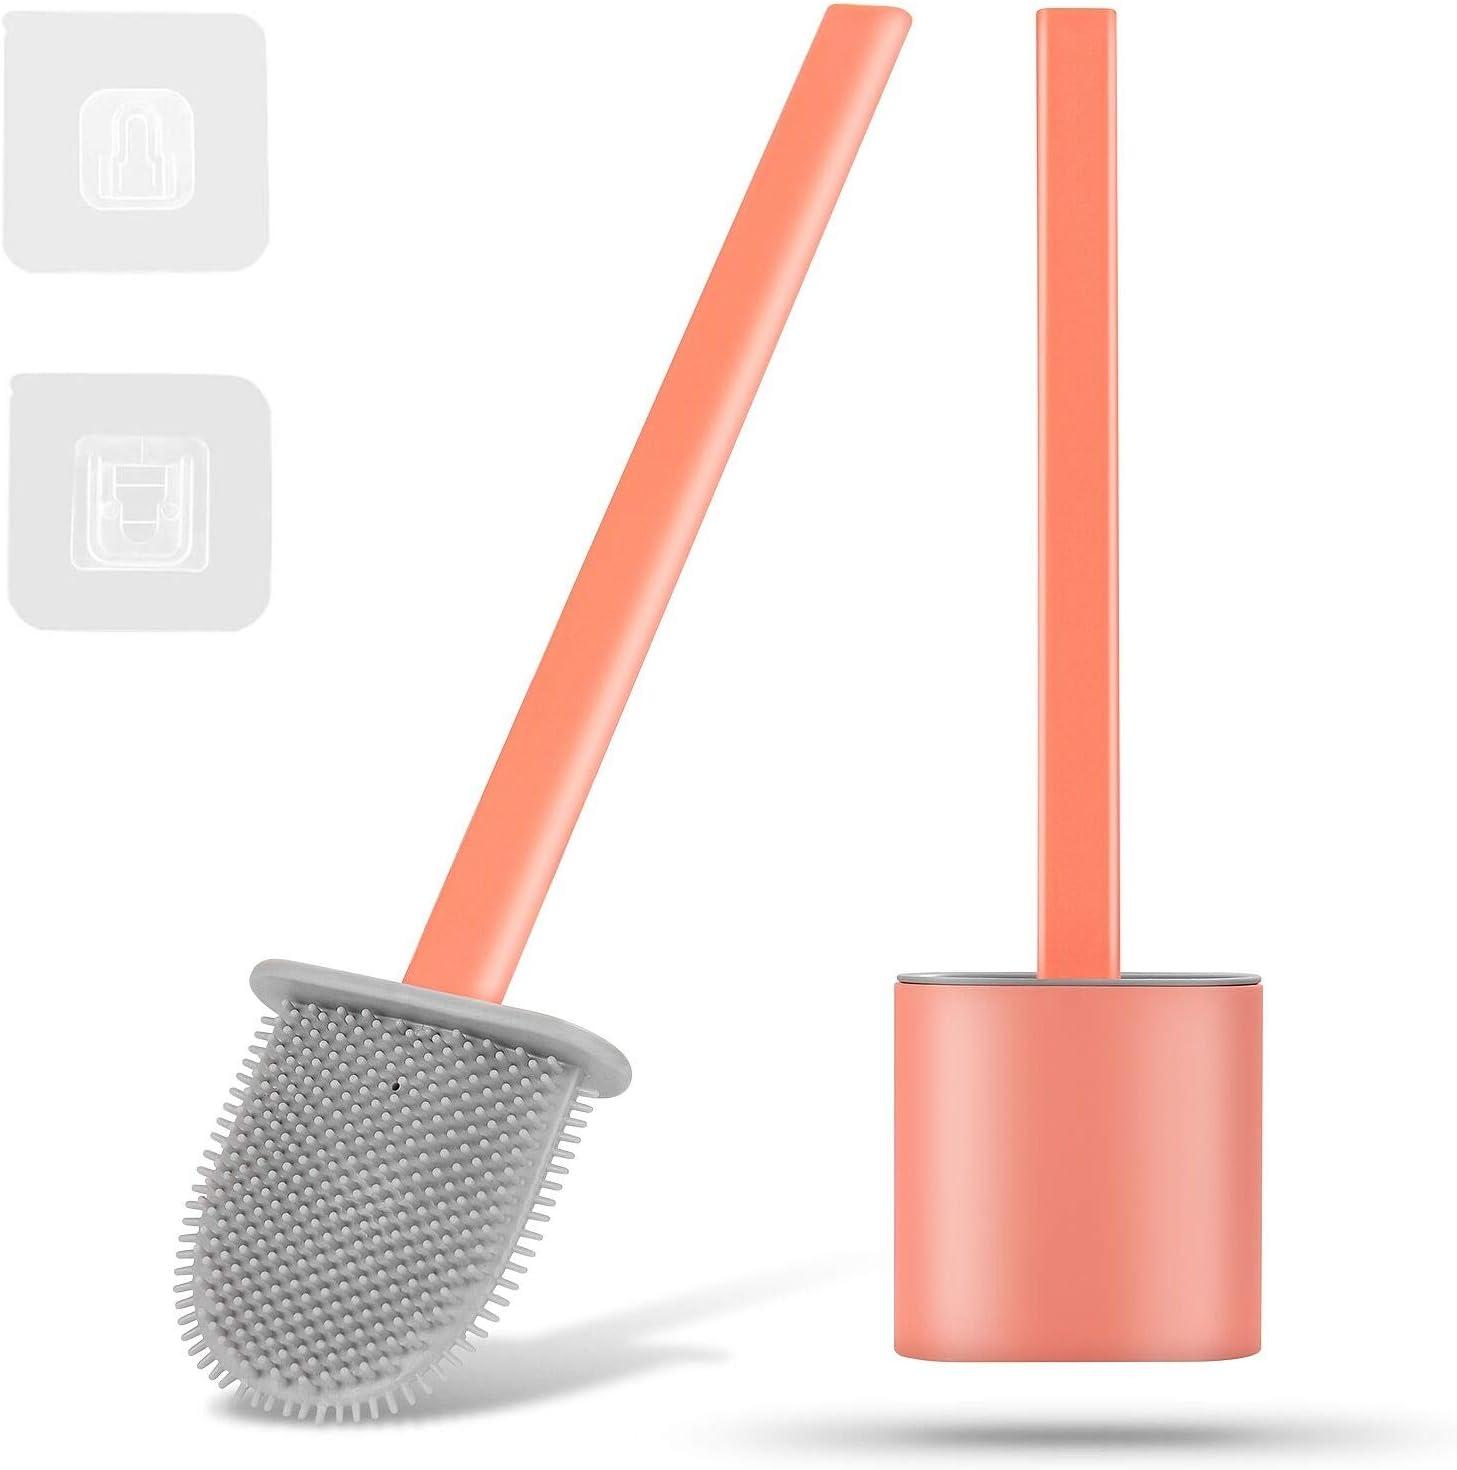 Cepillo de Silicona para Inodoro con Soporte Escobillas de Ba/ño Escobilla WC Plana Herefun Escobillas de Inodoro Cepillo Limpieza WC Juego de portaescobillas para Inodoro Ba/ño Azul